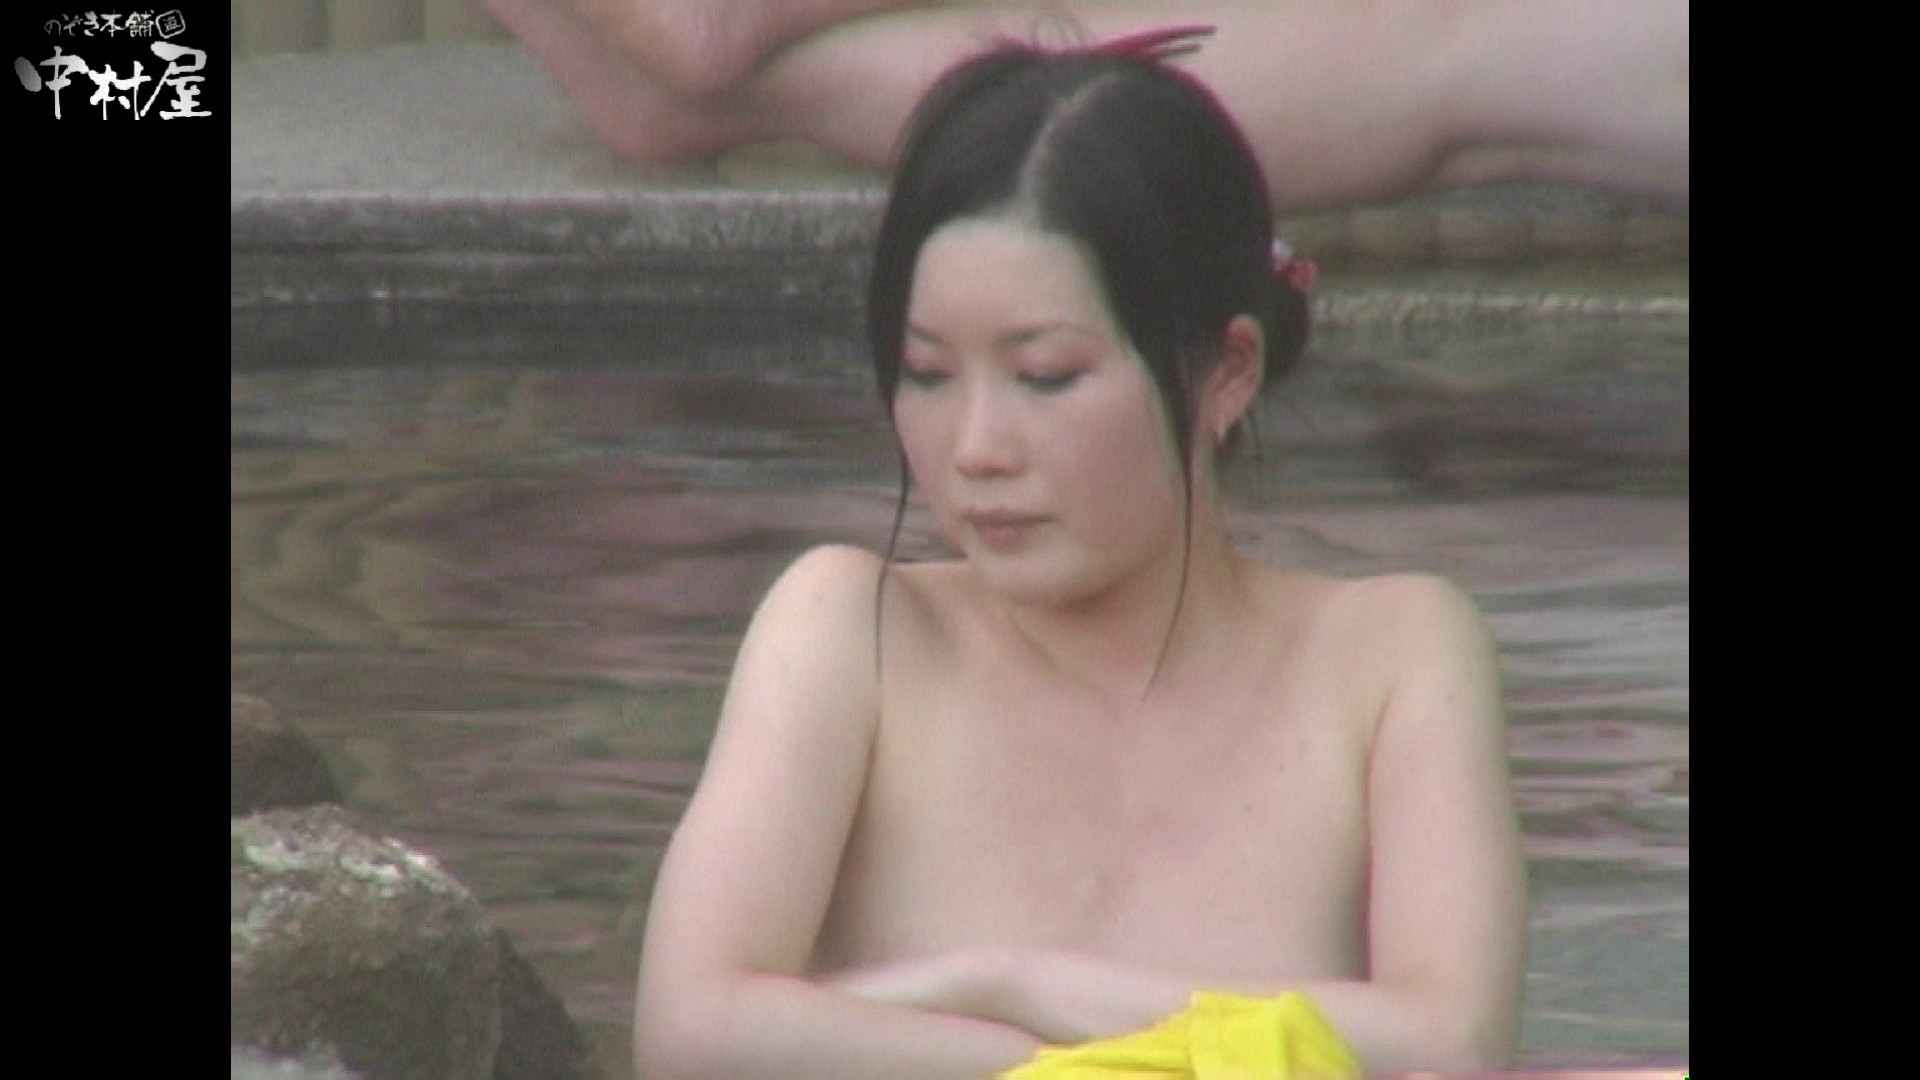 Aquaな露天風呂Vol.940 OLセックス | 露天  98画像 55